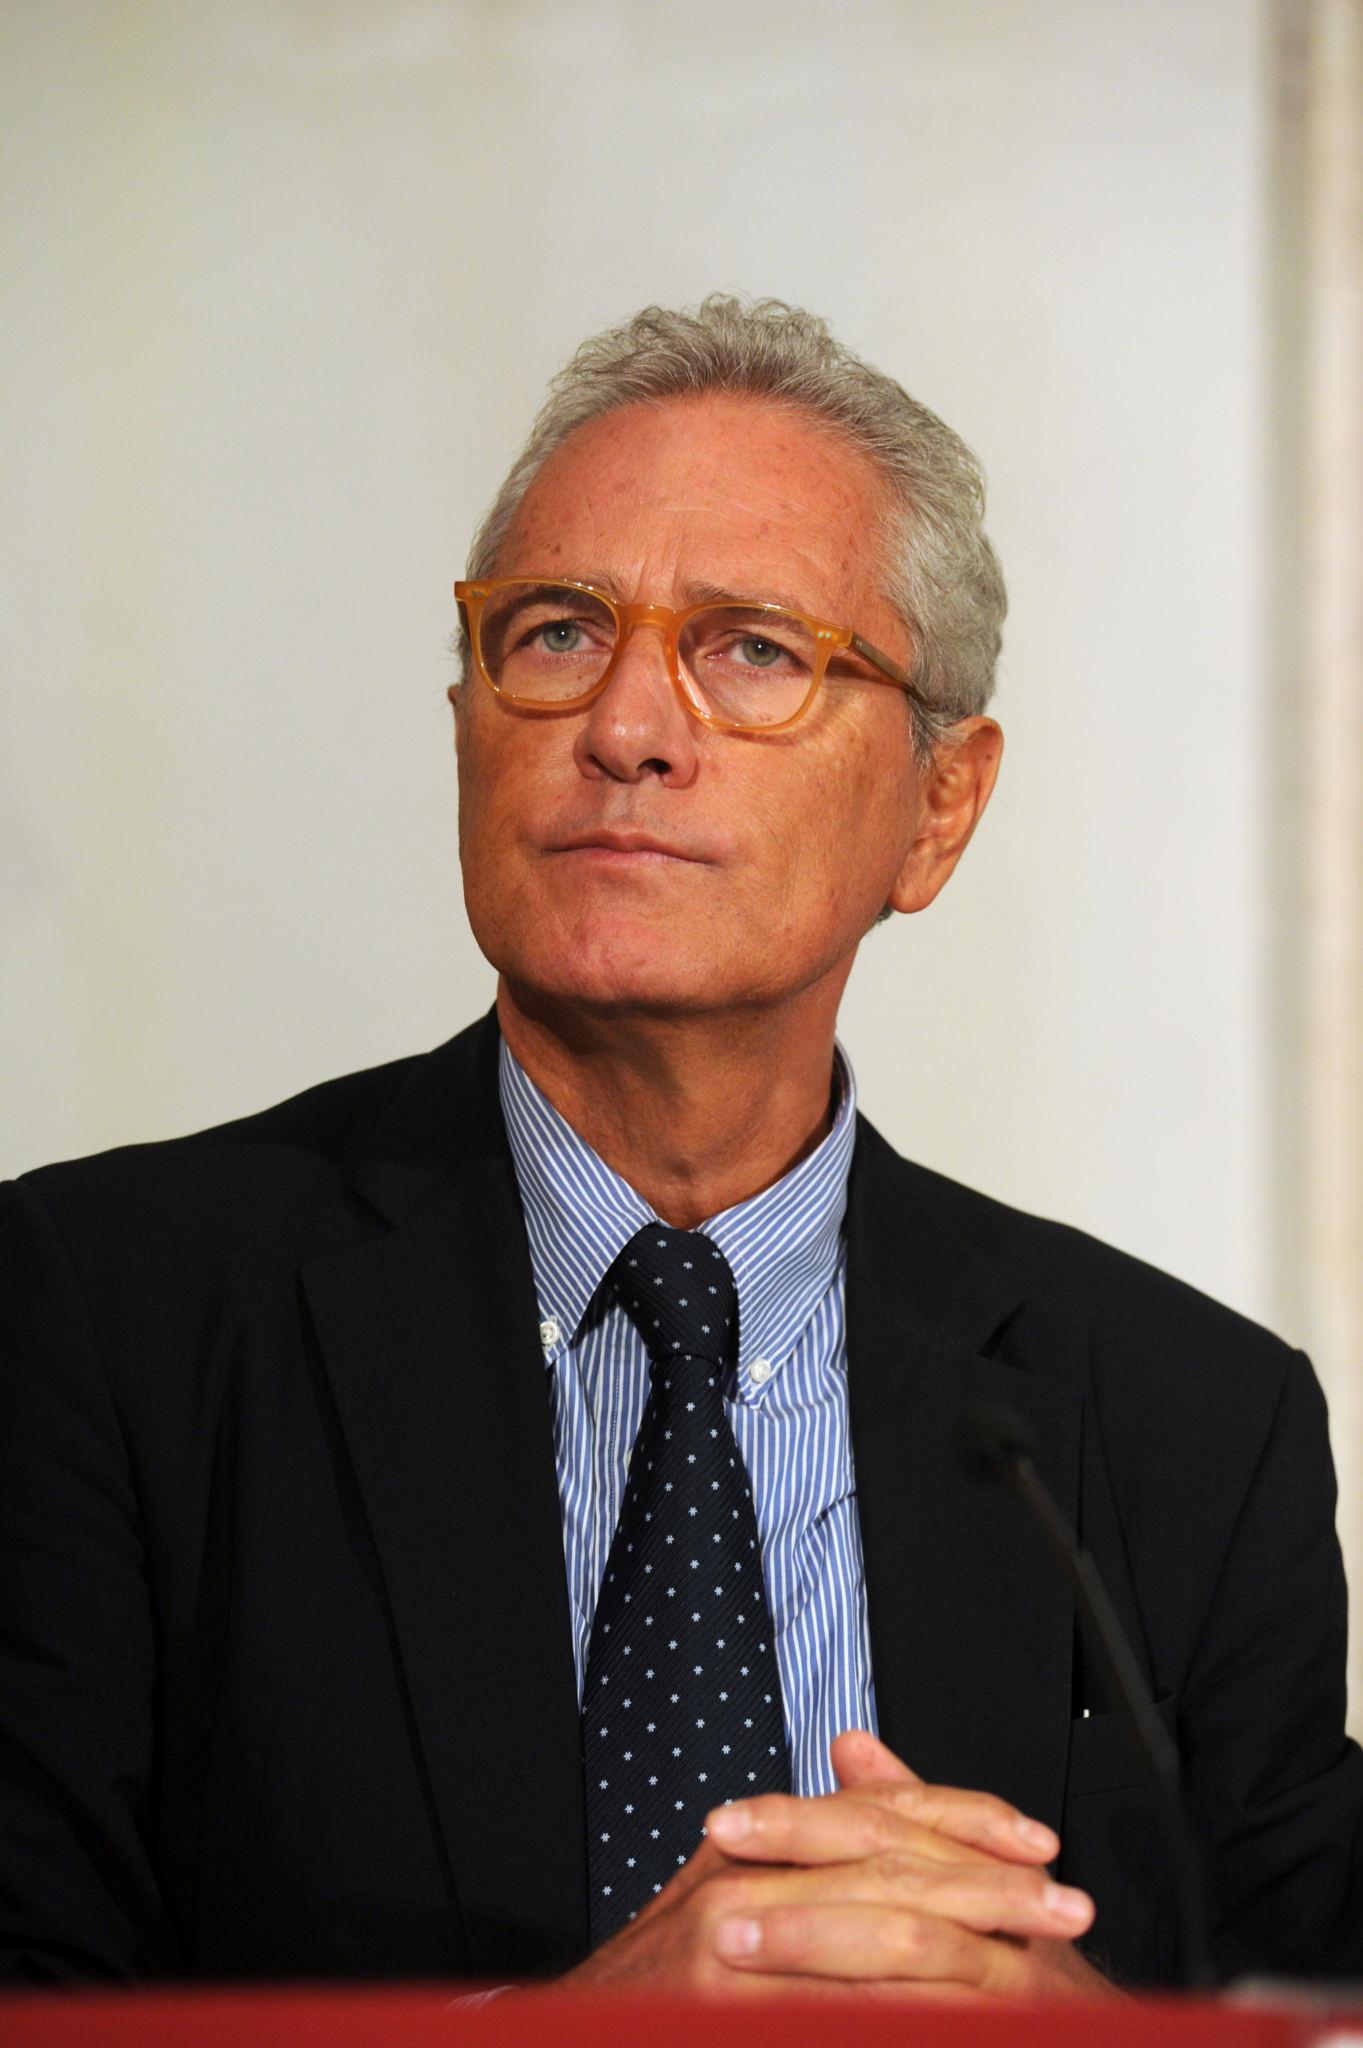 Francesco Rutelli (ANICA President)